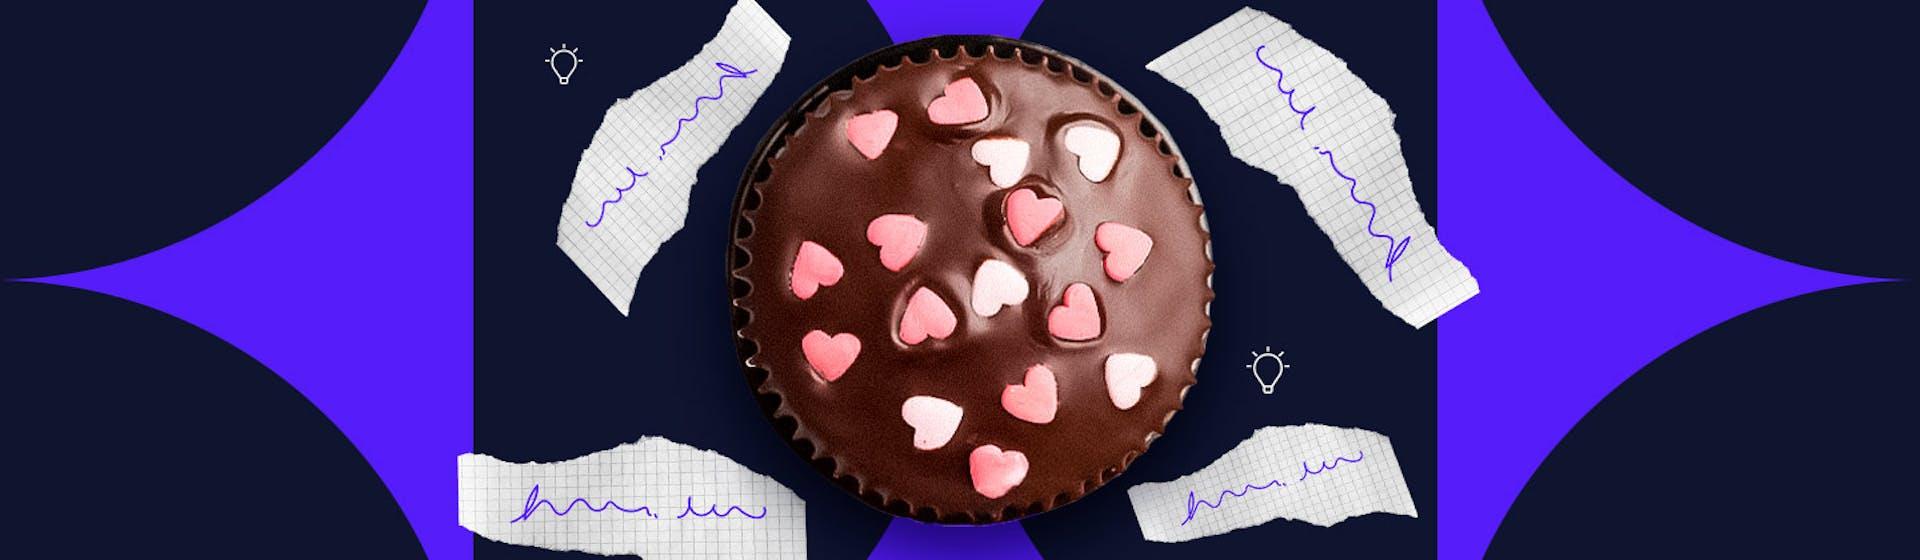 +60 ideas para un slogan de cupcakes tan espectacular como tus creaciones